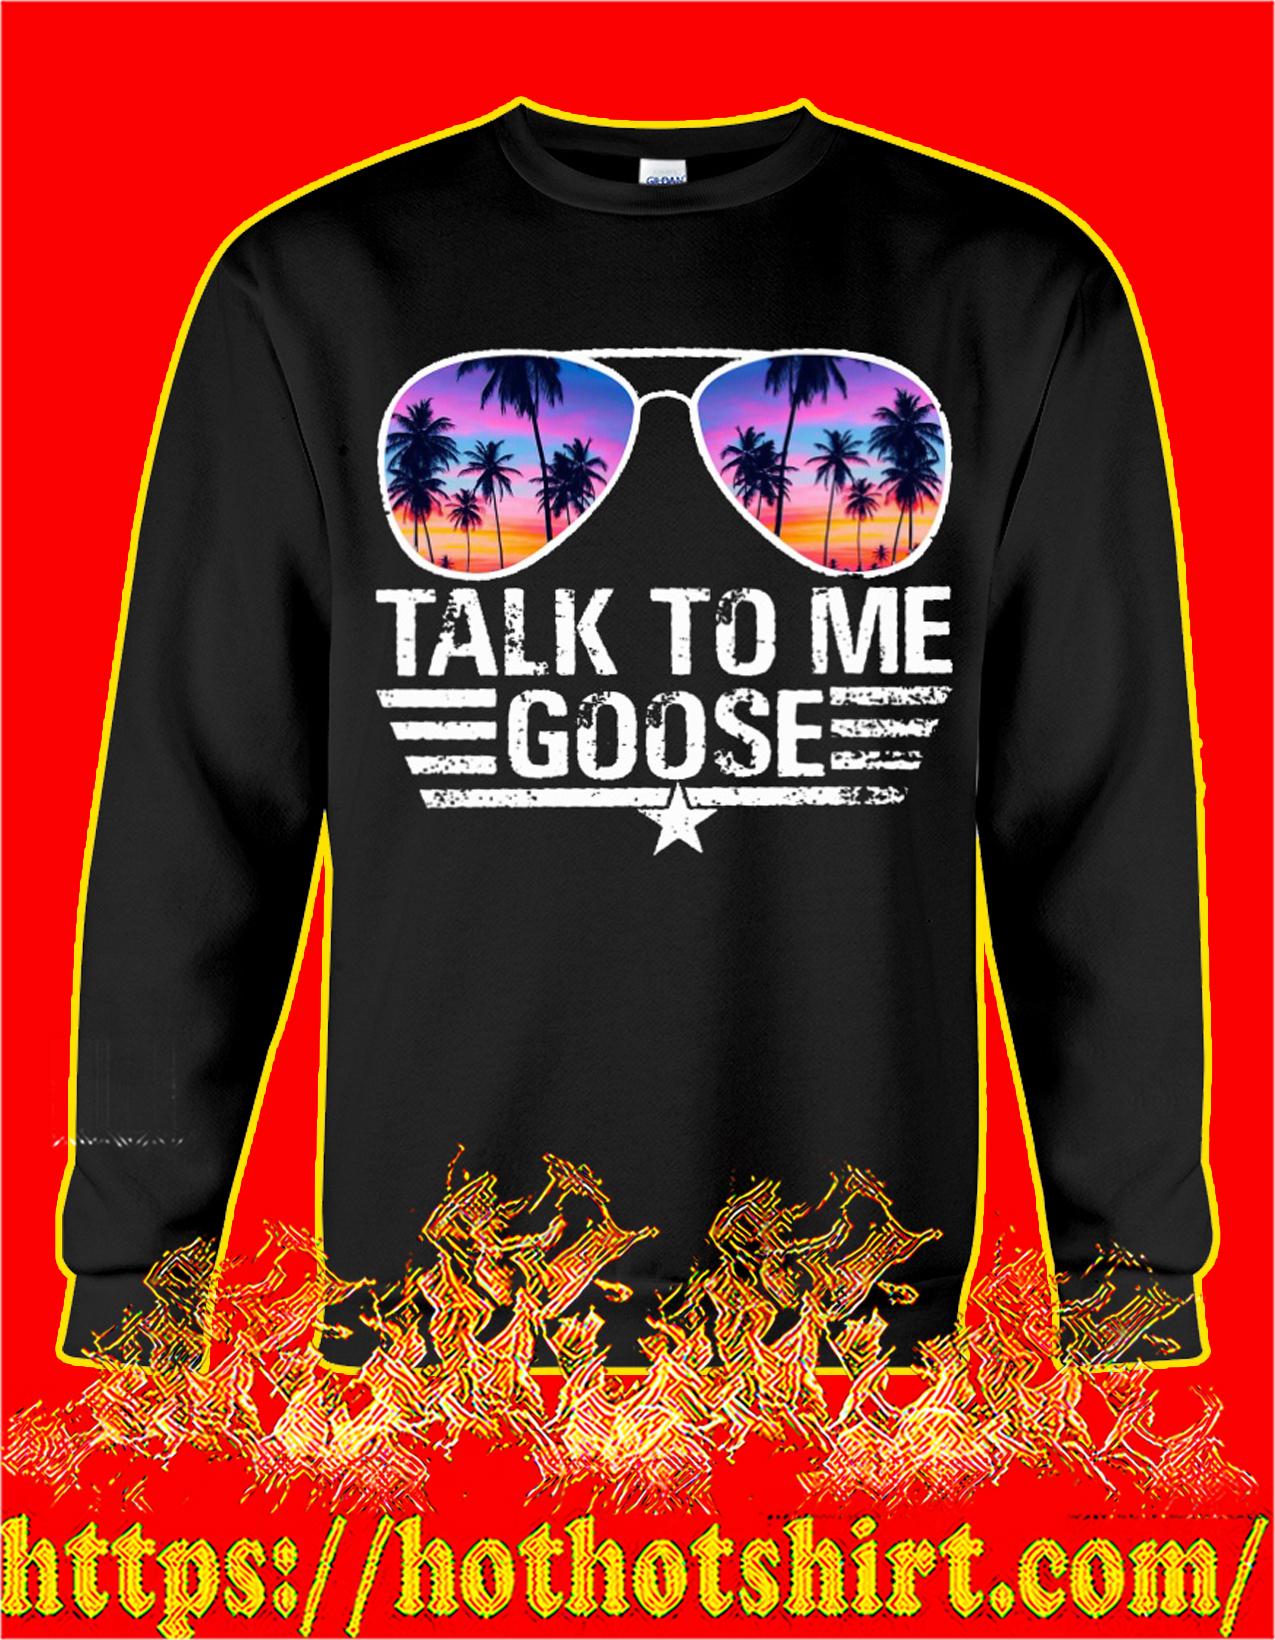 talk to me goose sweatshirt